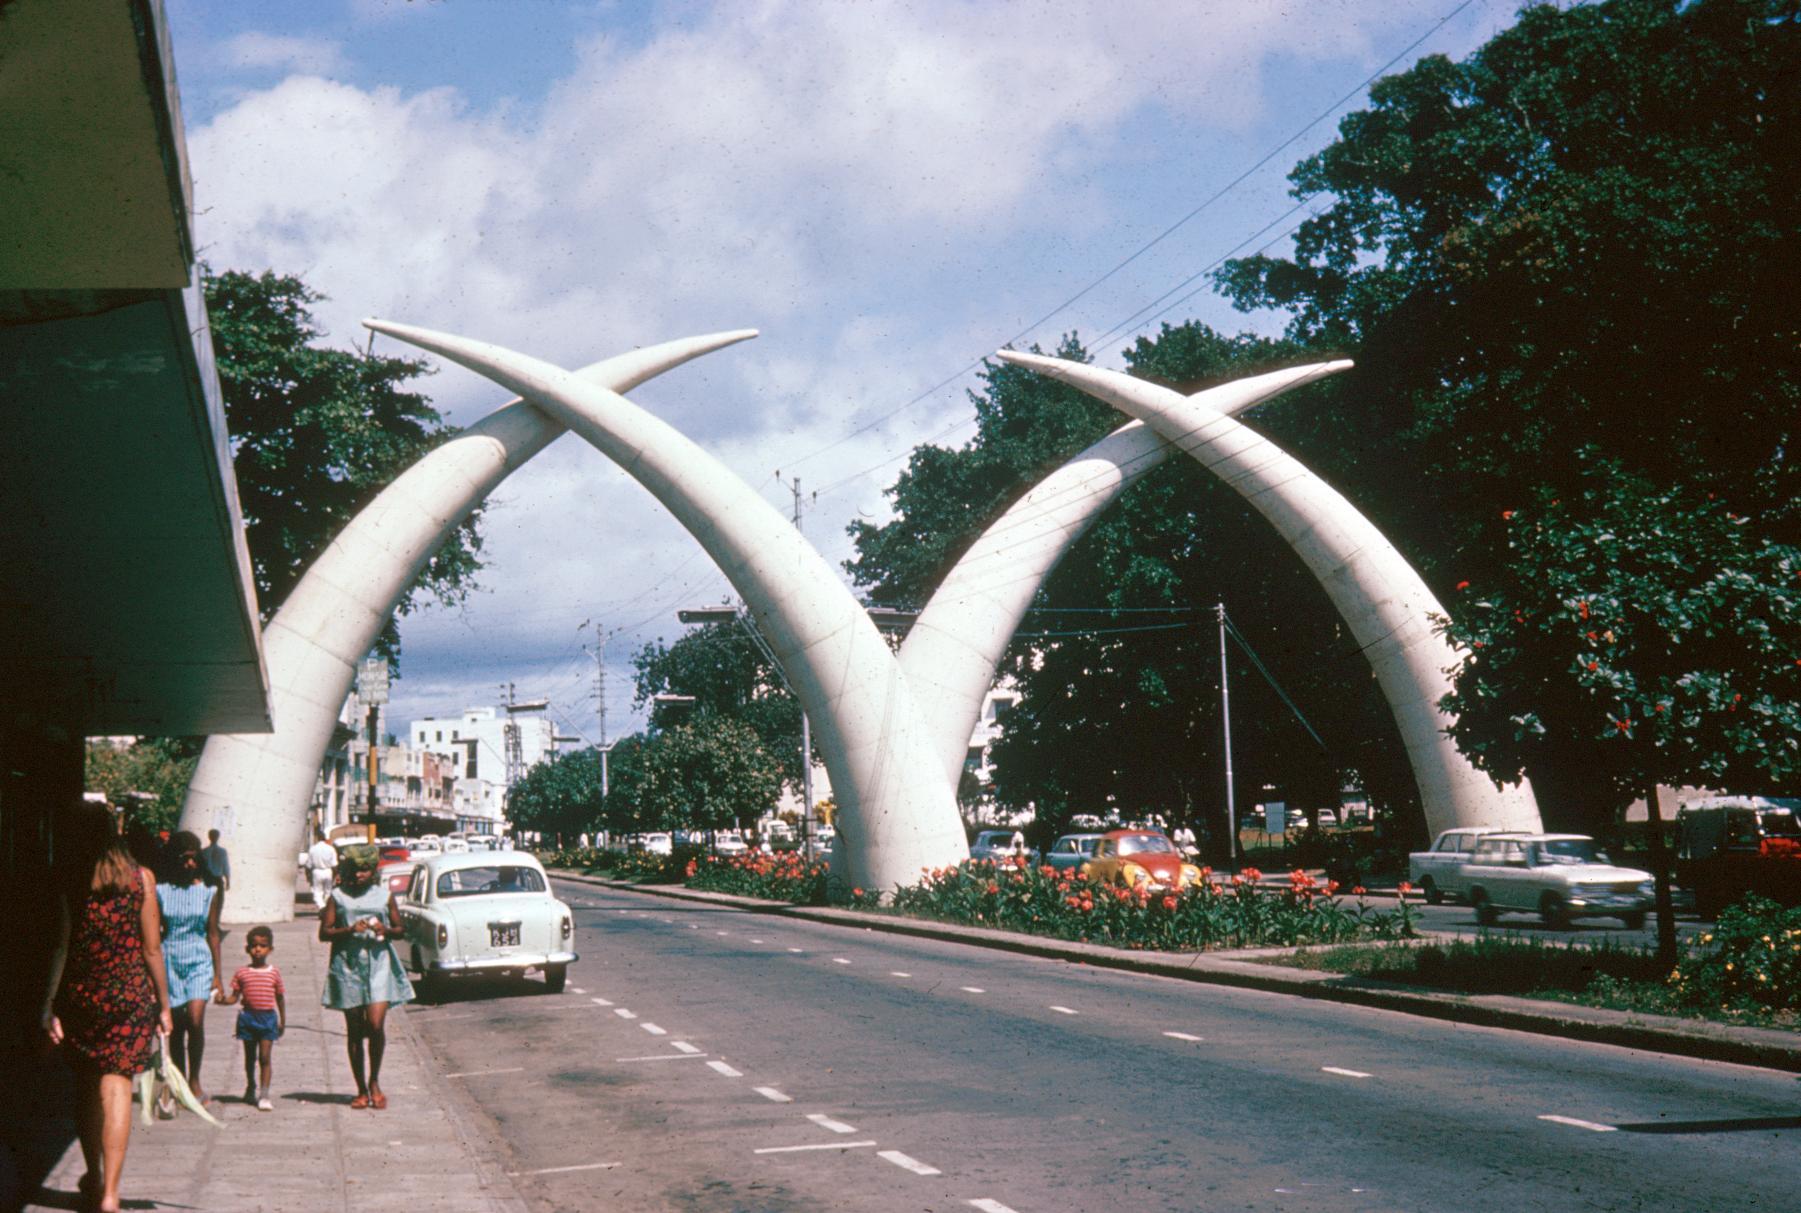 Crossed Elephant Tusks : Symbol of City of Mombasa